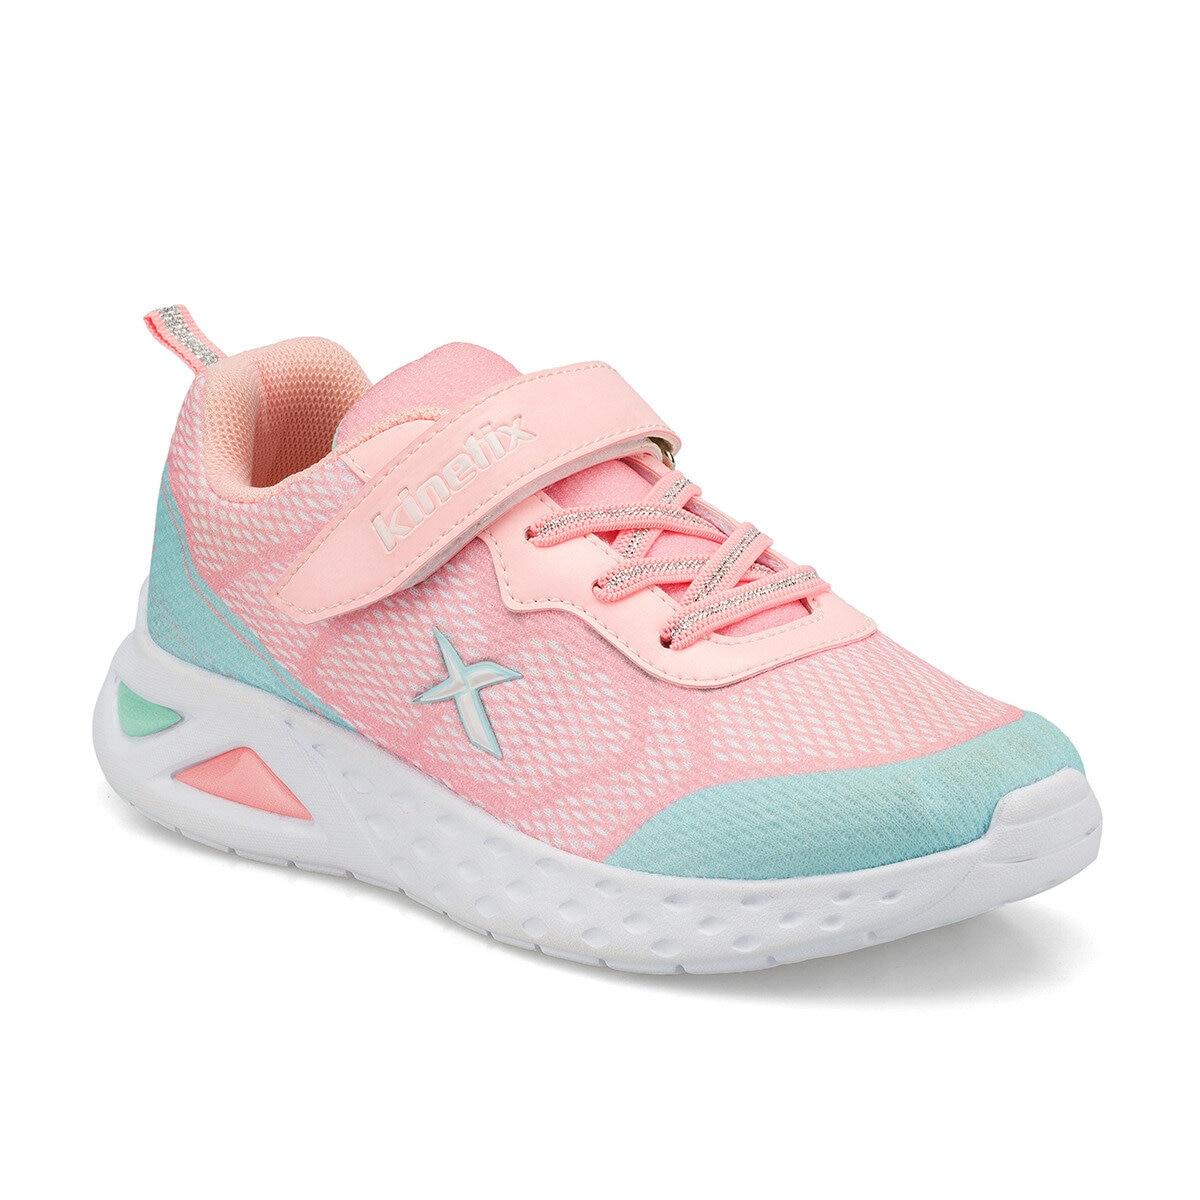 FLO RAIN Light Pink Female Child Sneaker Shoes KINETIX